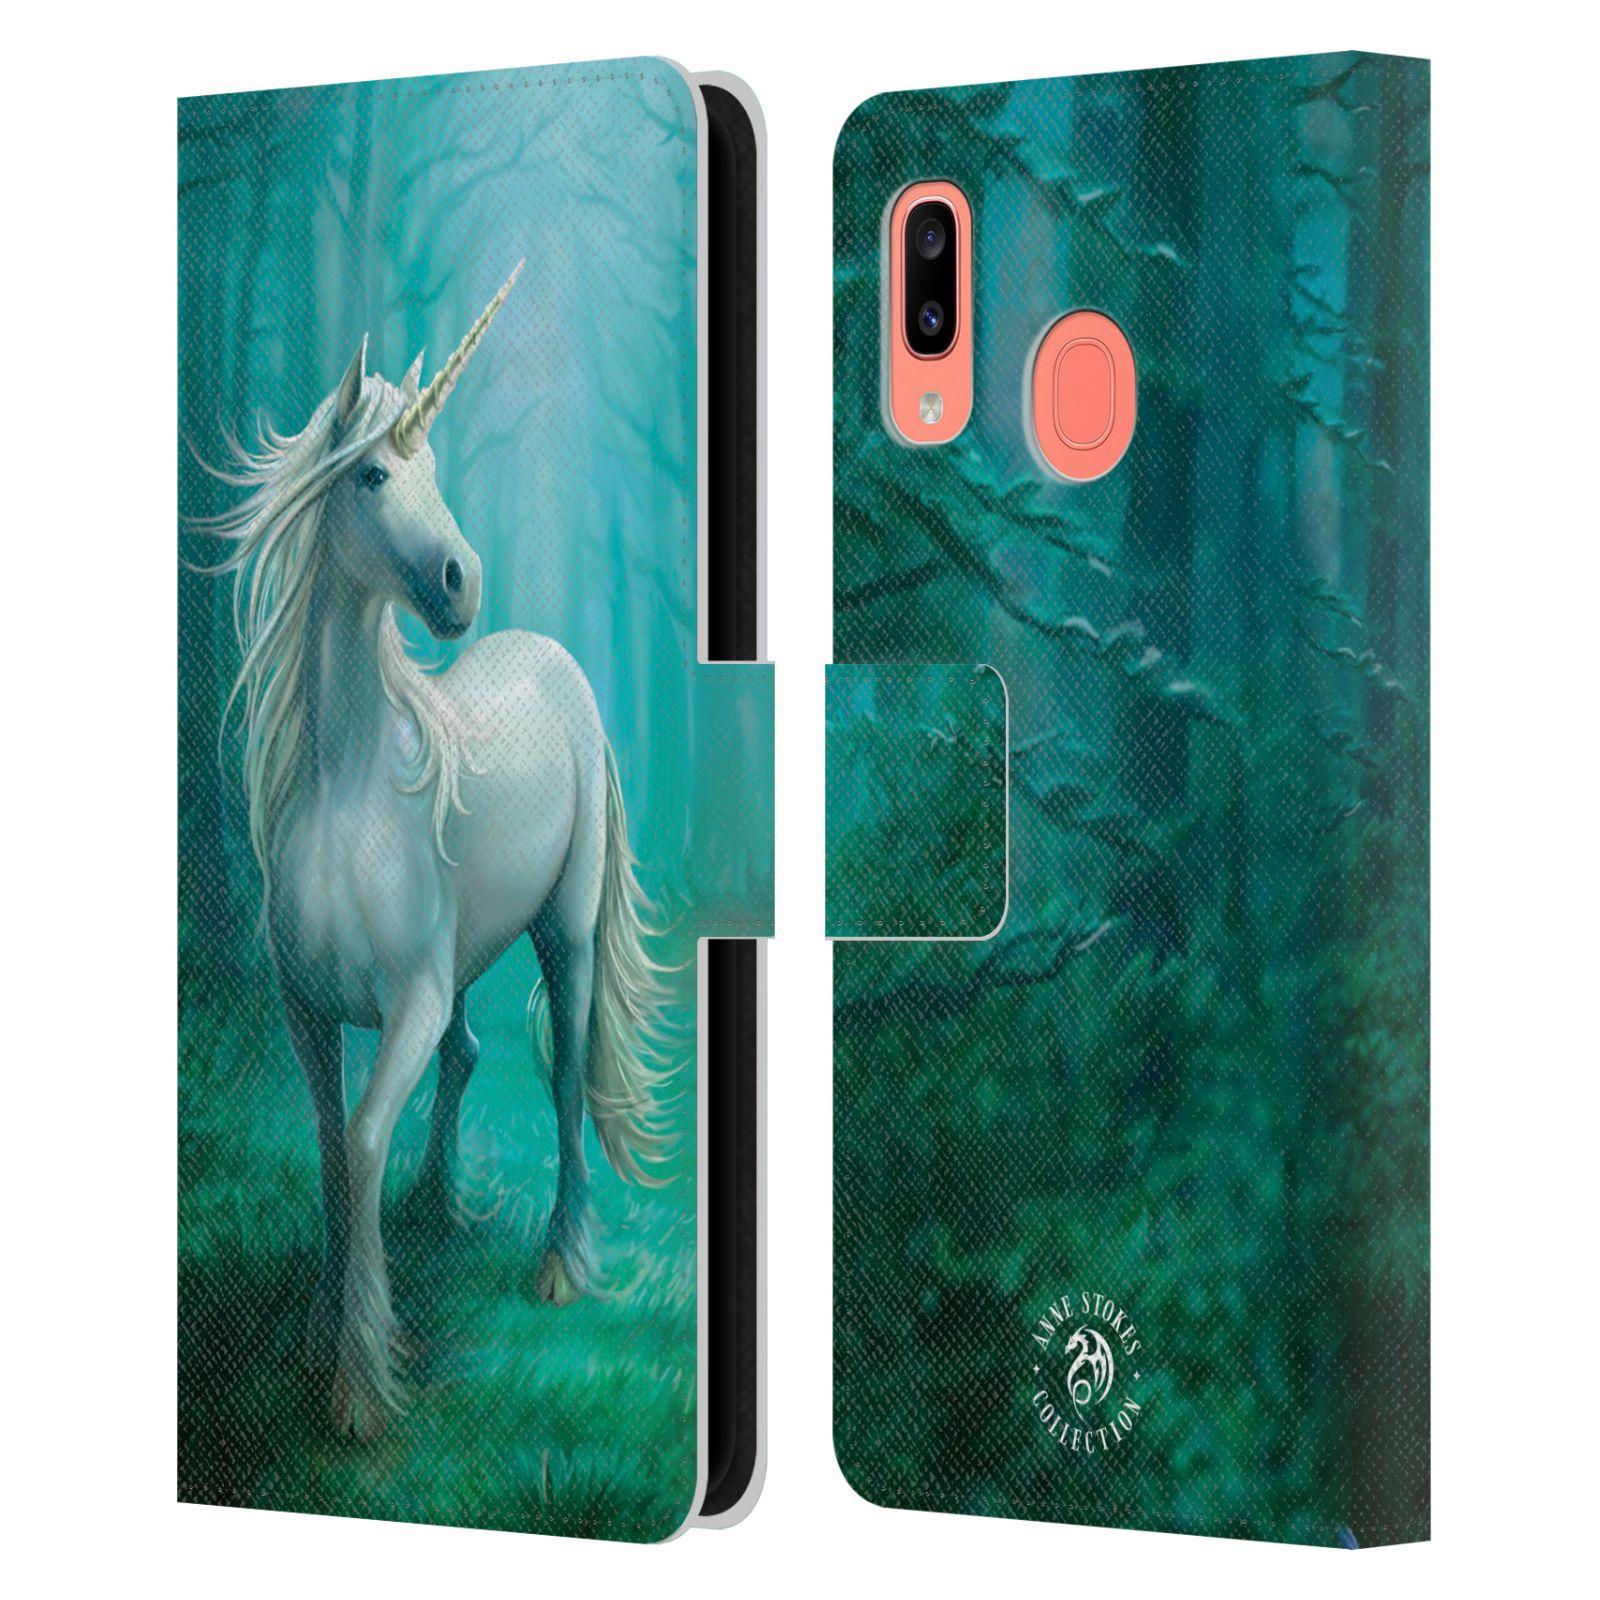 Pouzdro na mobil Samsung Galaxy A20 - Head Case - fantasy - jednorožec v lese